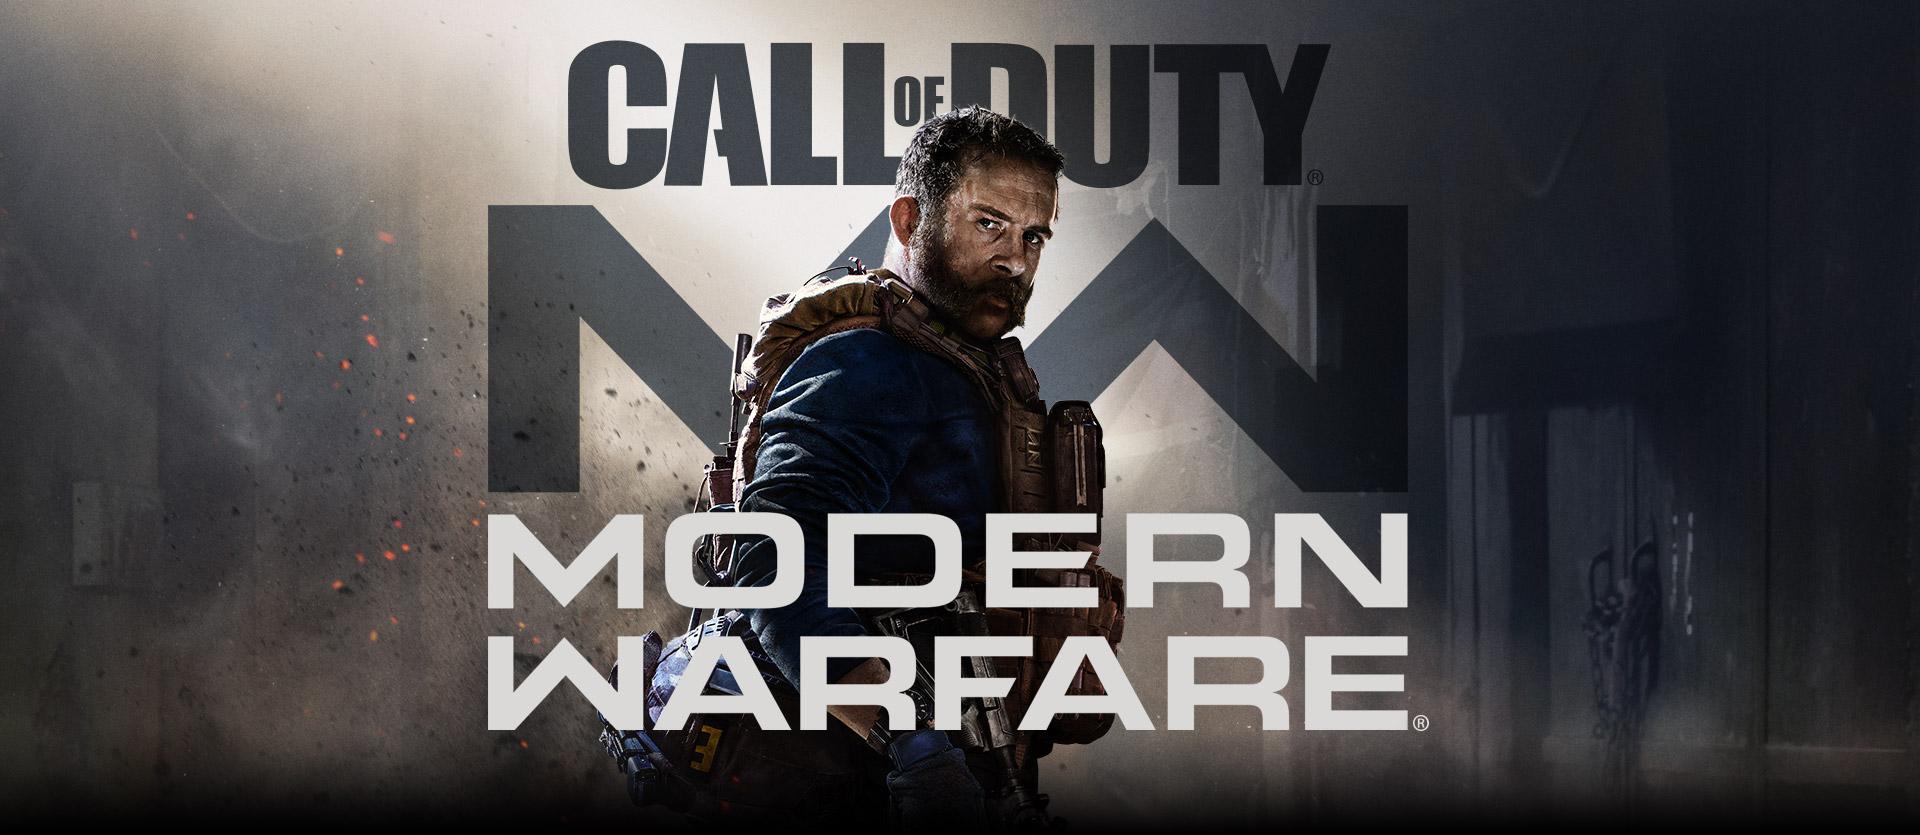 Call of Duty: Advanced Warfare Installation and Setup